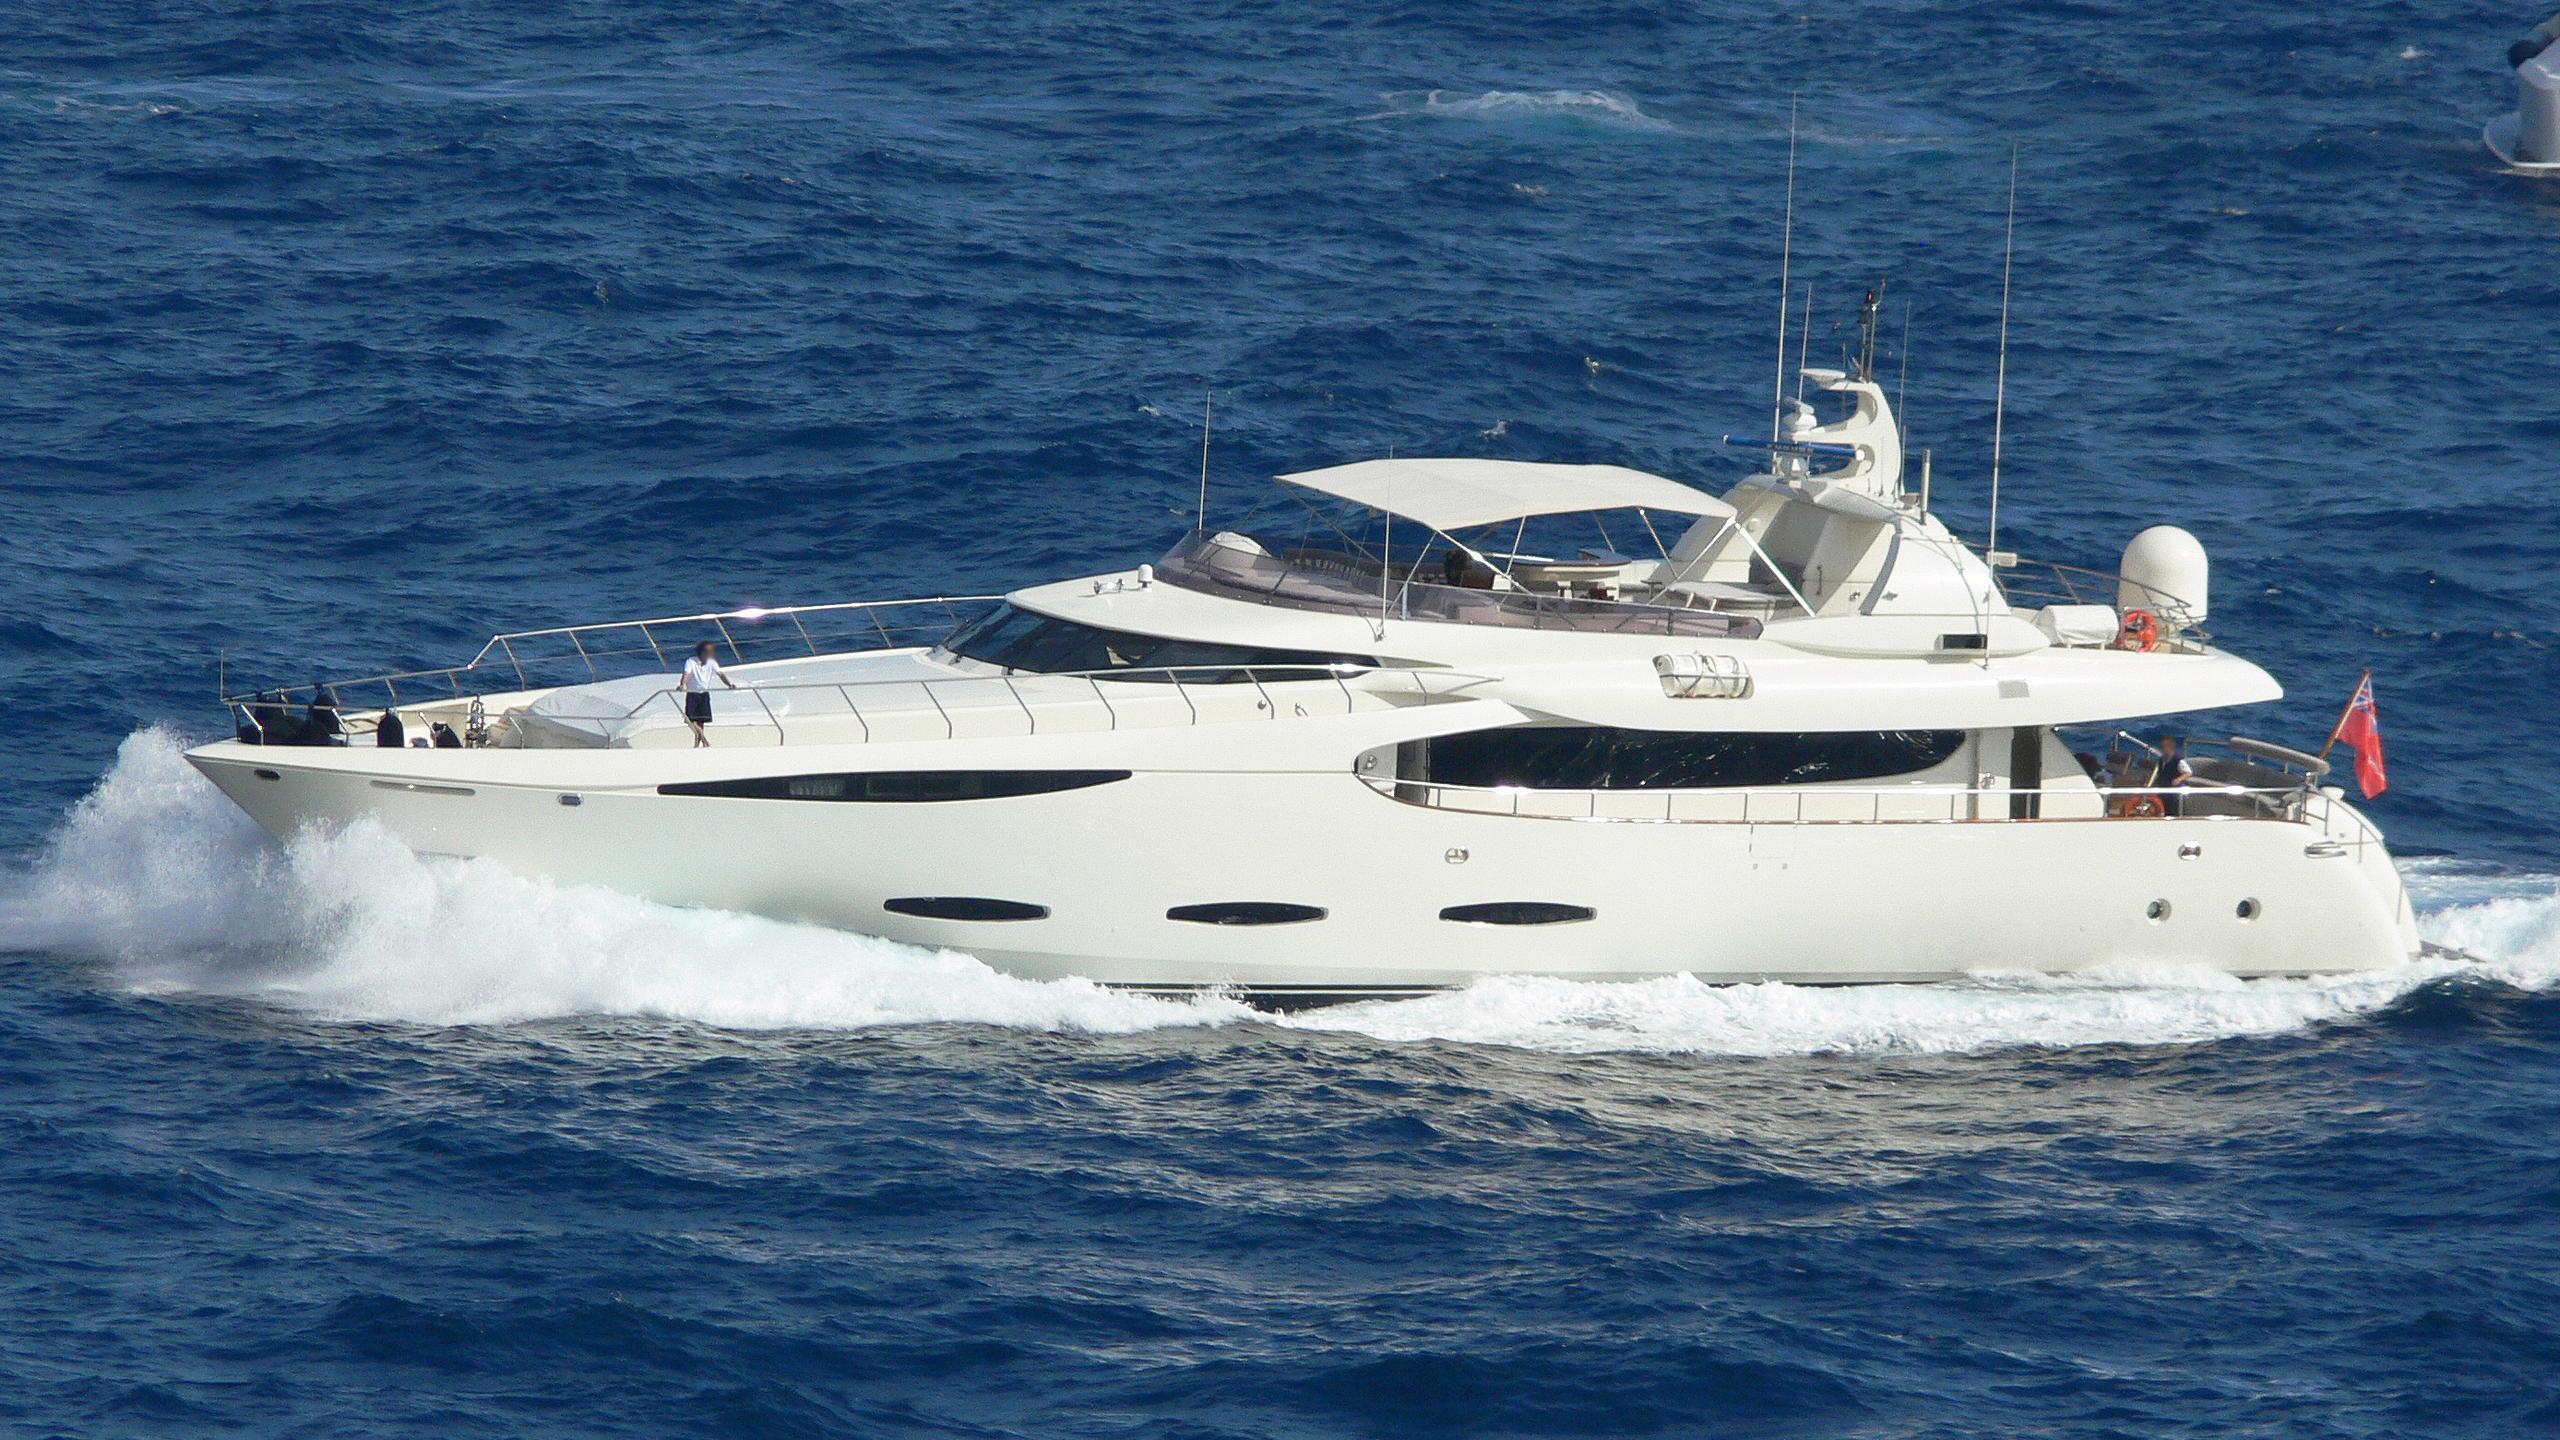 mabruk-iii-motor-yacht-leight-notika-centaurian-115-2004-36m-cruising-profile